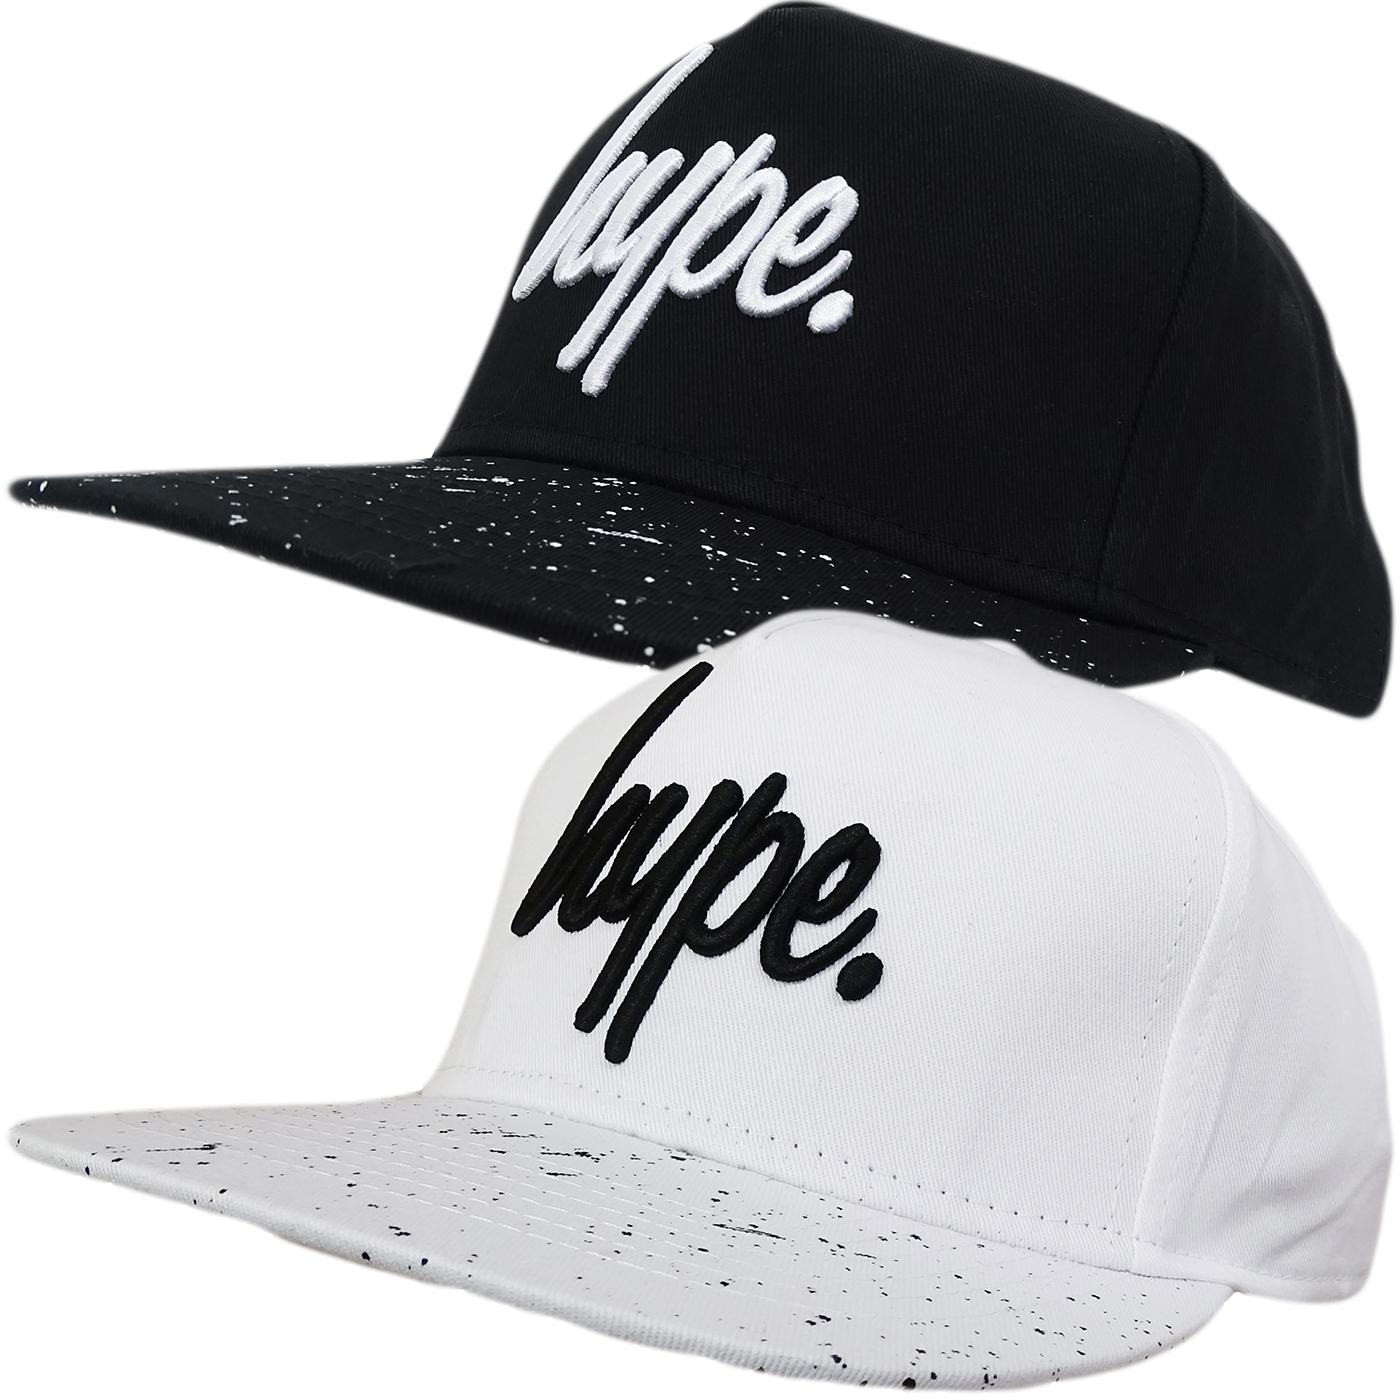 d93123f17e1 Hype Speckled Peack Snapback Cap   Headwear - Hype Speckle Peak Thumbnail 1  ...